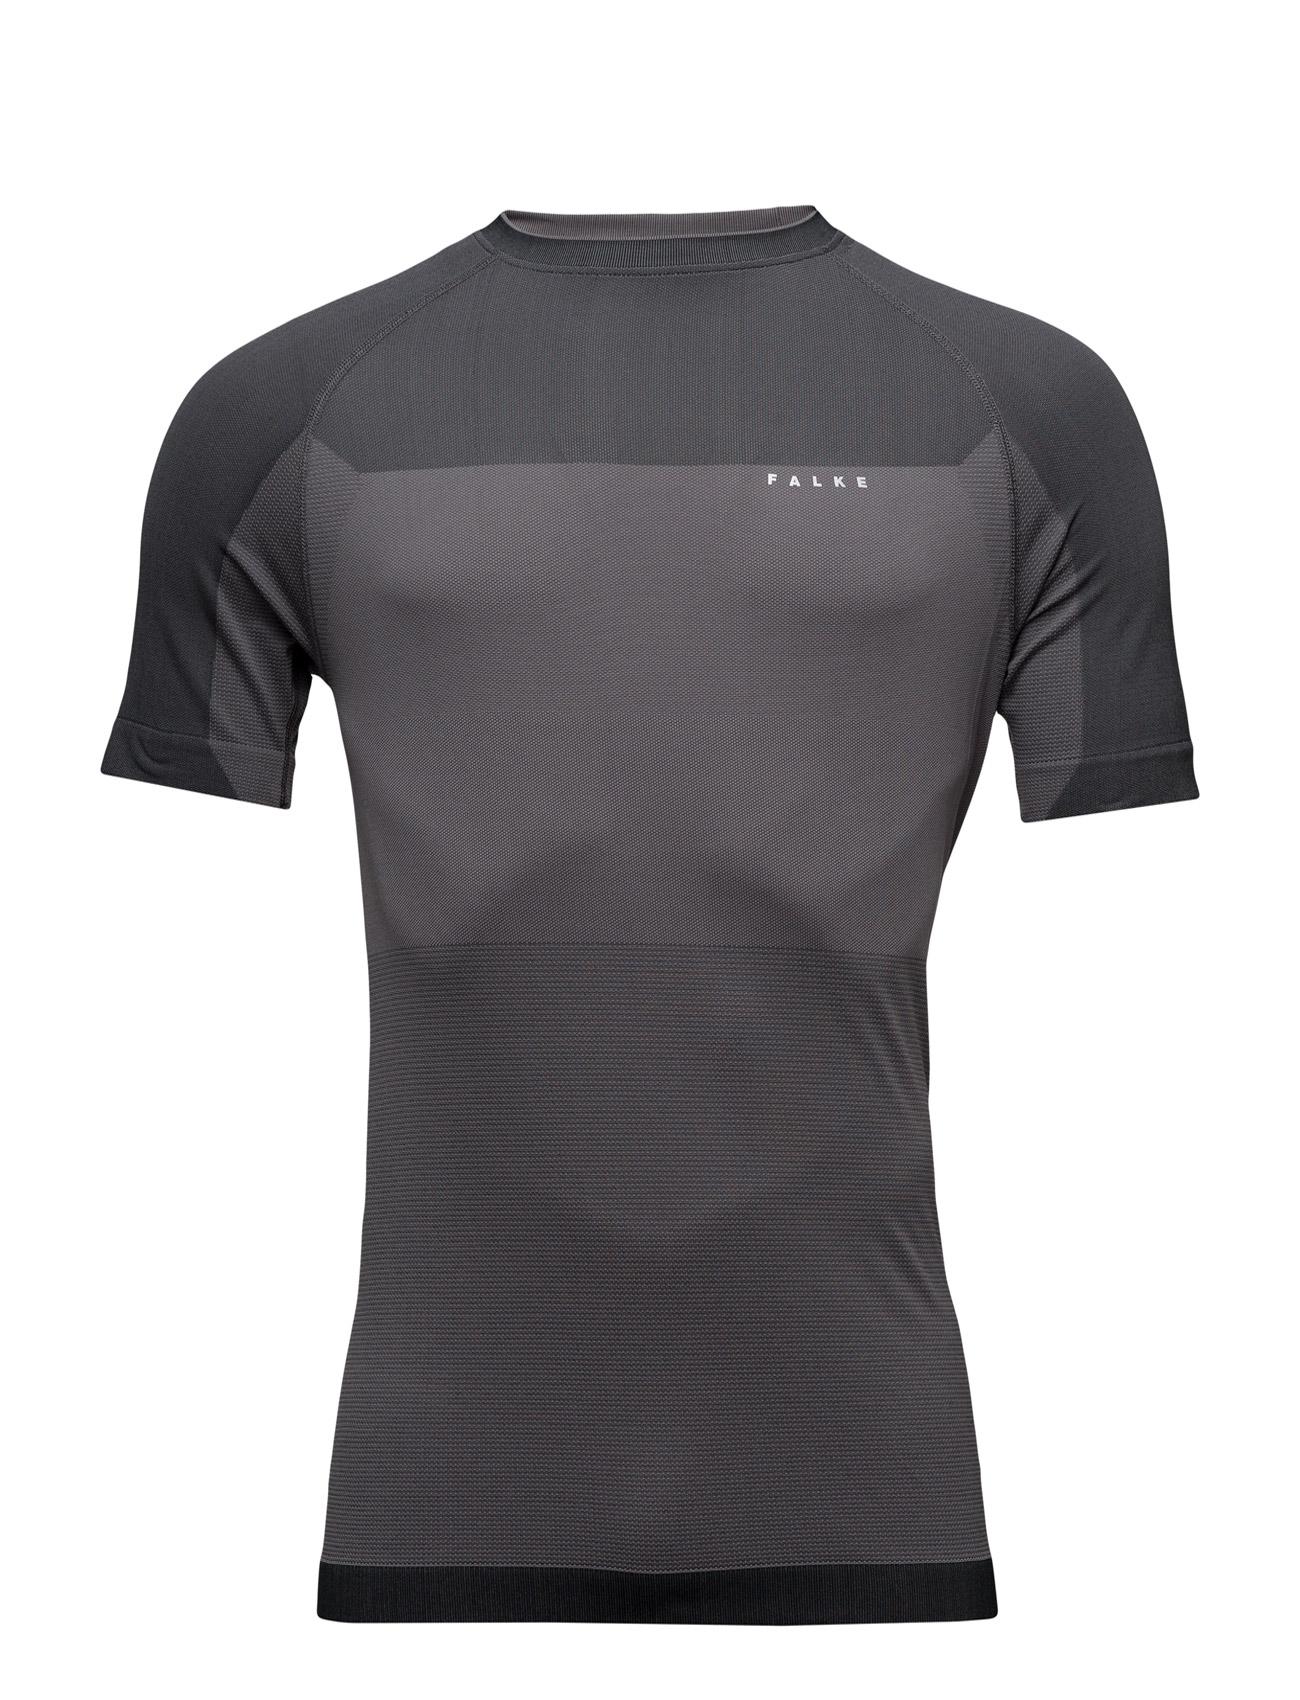 falke sport – Ru t-shirt bc m på boozt.com dk